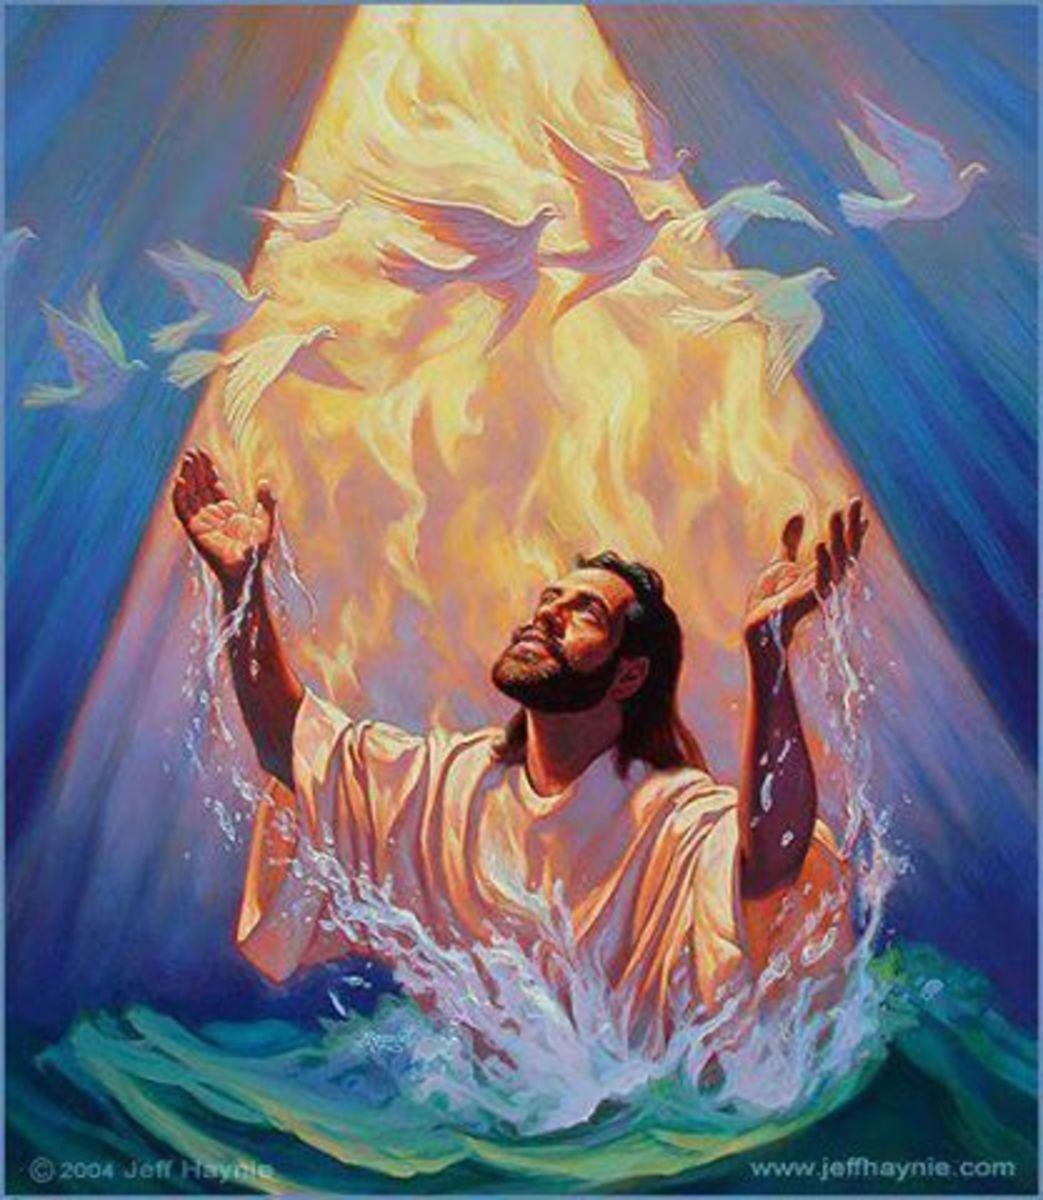 Painting A Portrait of Glory (Ephesians 2:10 KJV)